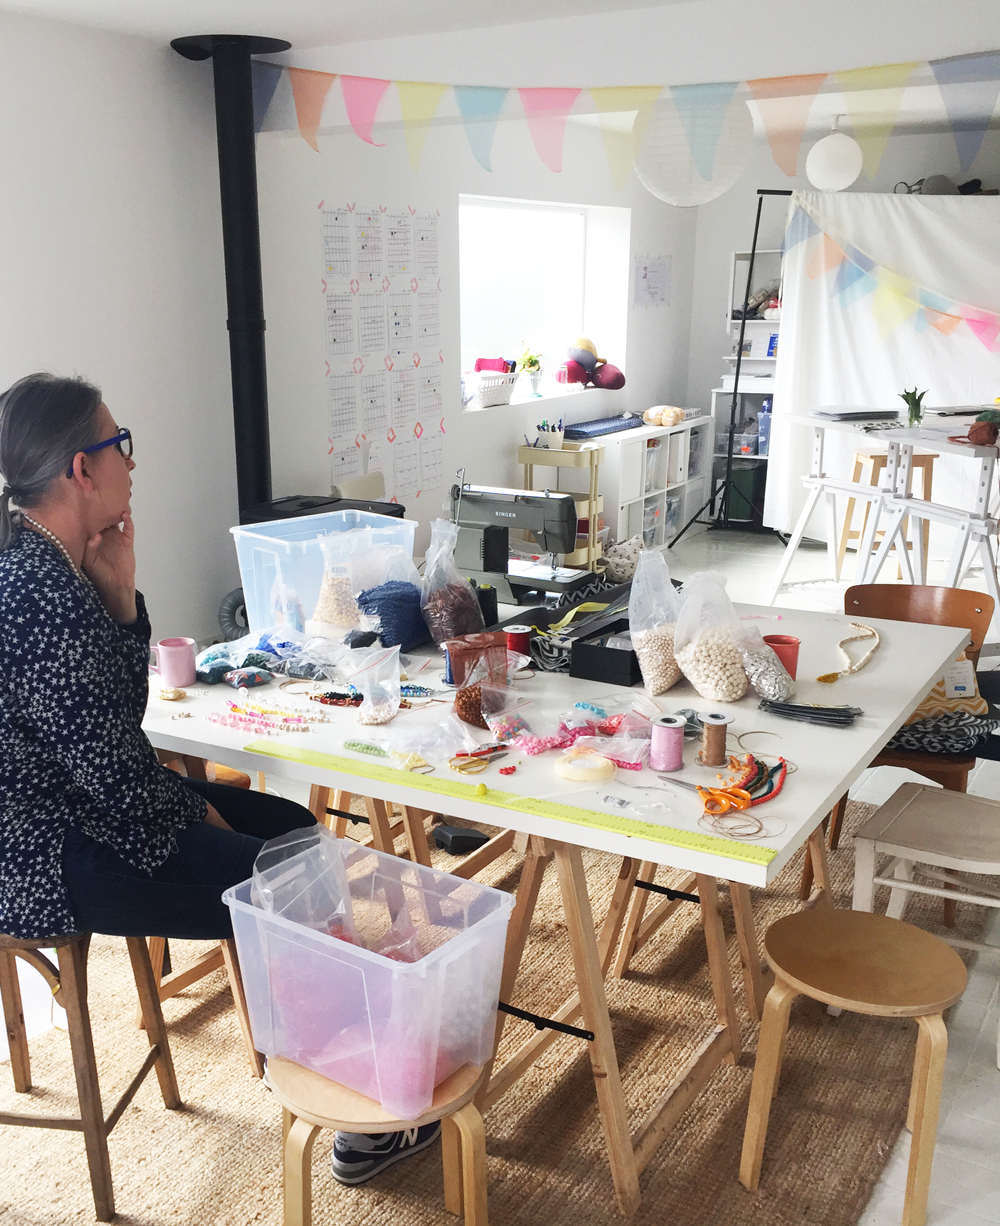 atelier-chouette-kit-creation-bijoux-1000